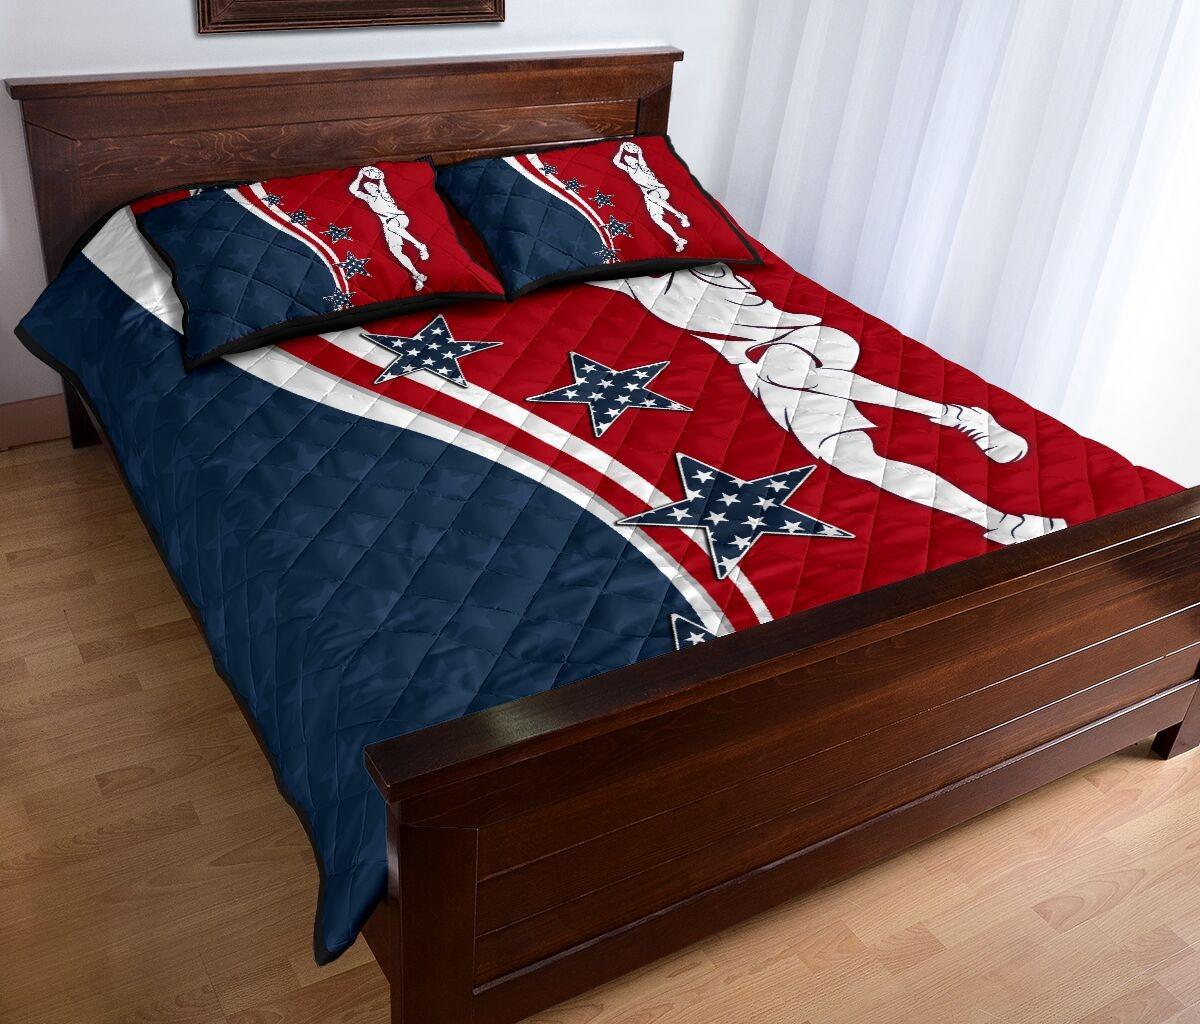 American baseketball quilt bedding set2